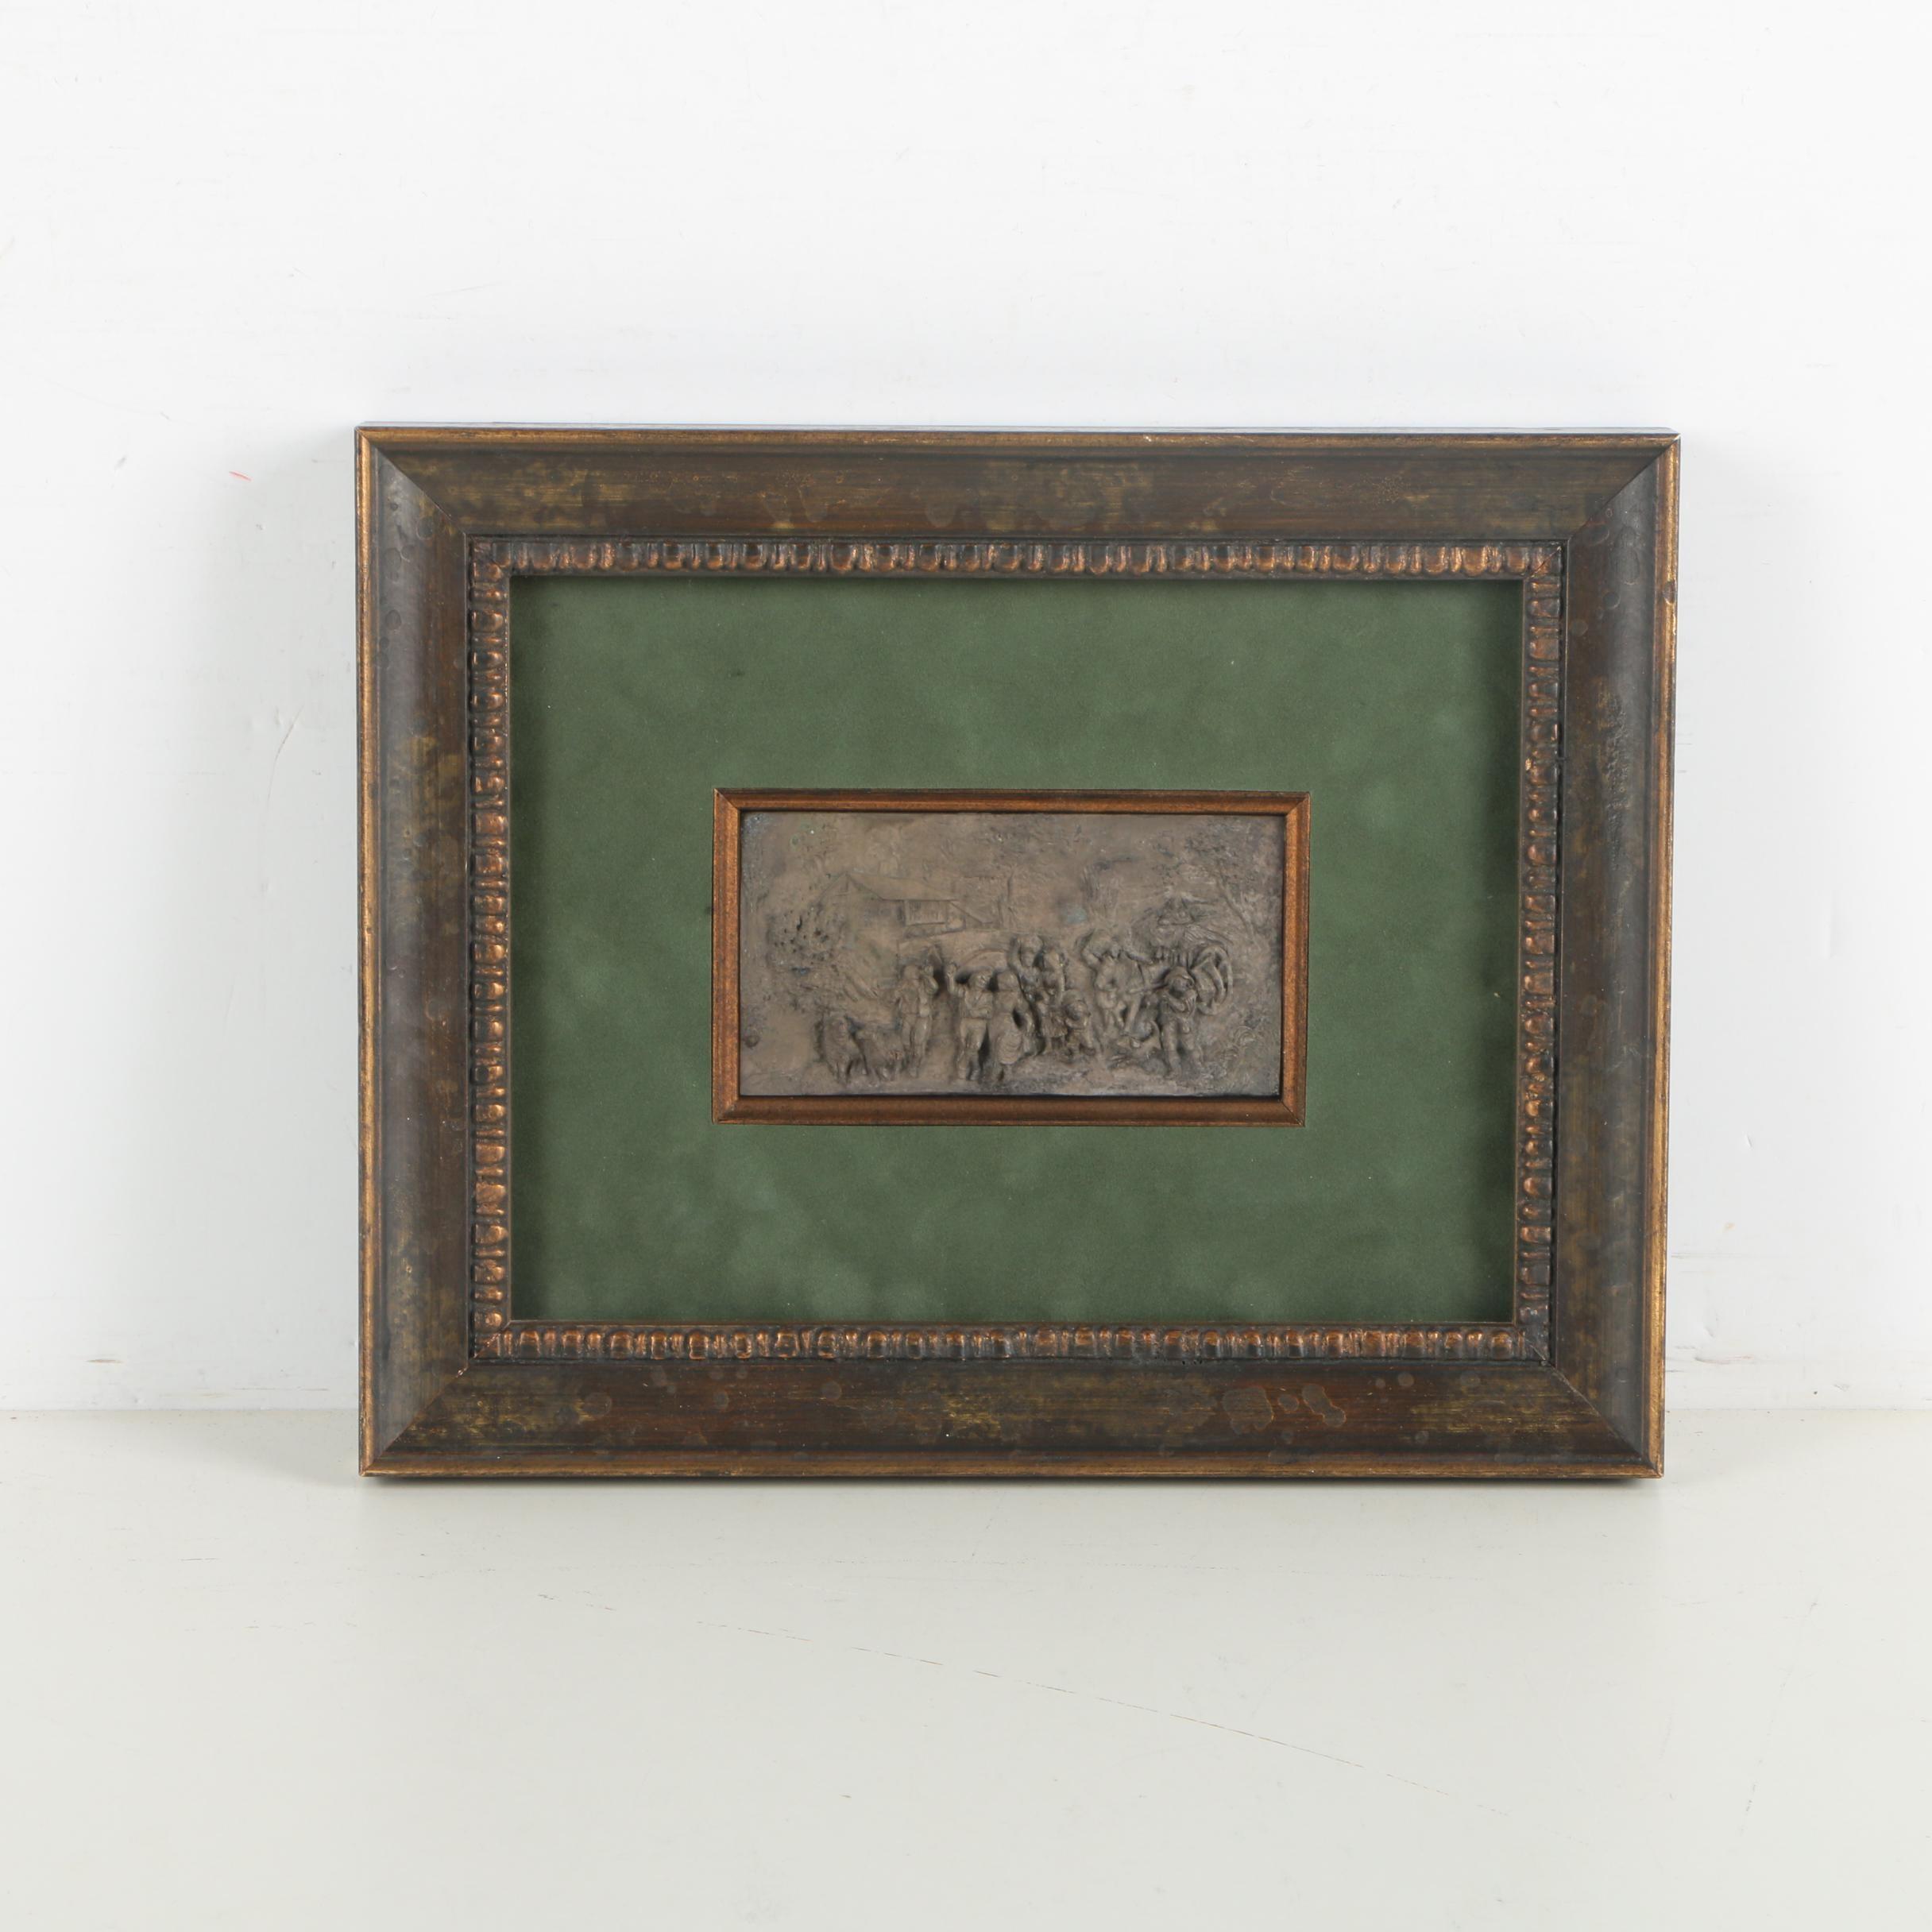 Copper Bas Relief Plate of a Dutch Pastoral Scene